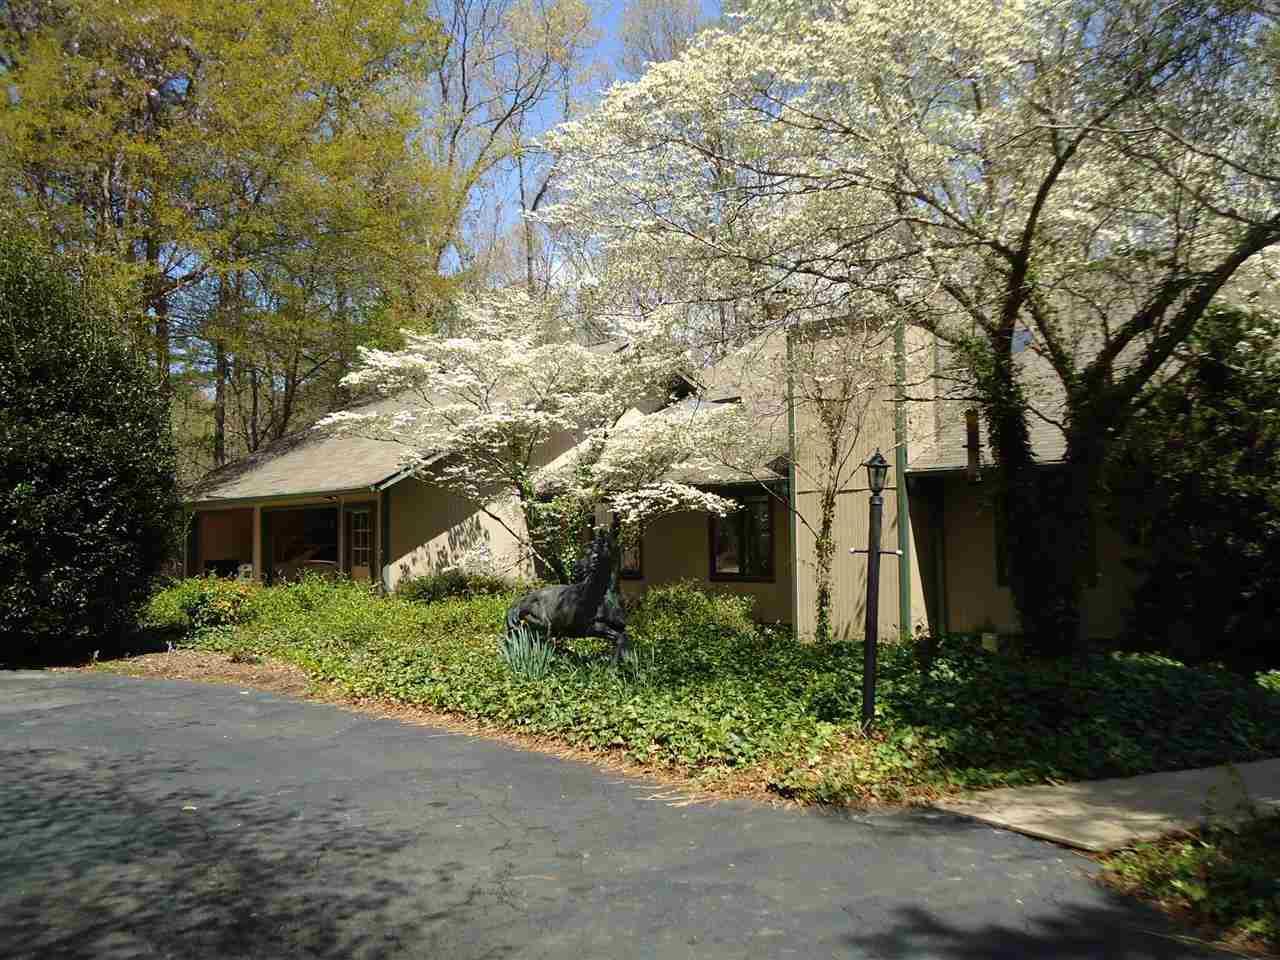 Real Estate for Sale, ListingId: 30280258, Clemson,SC29631